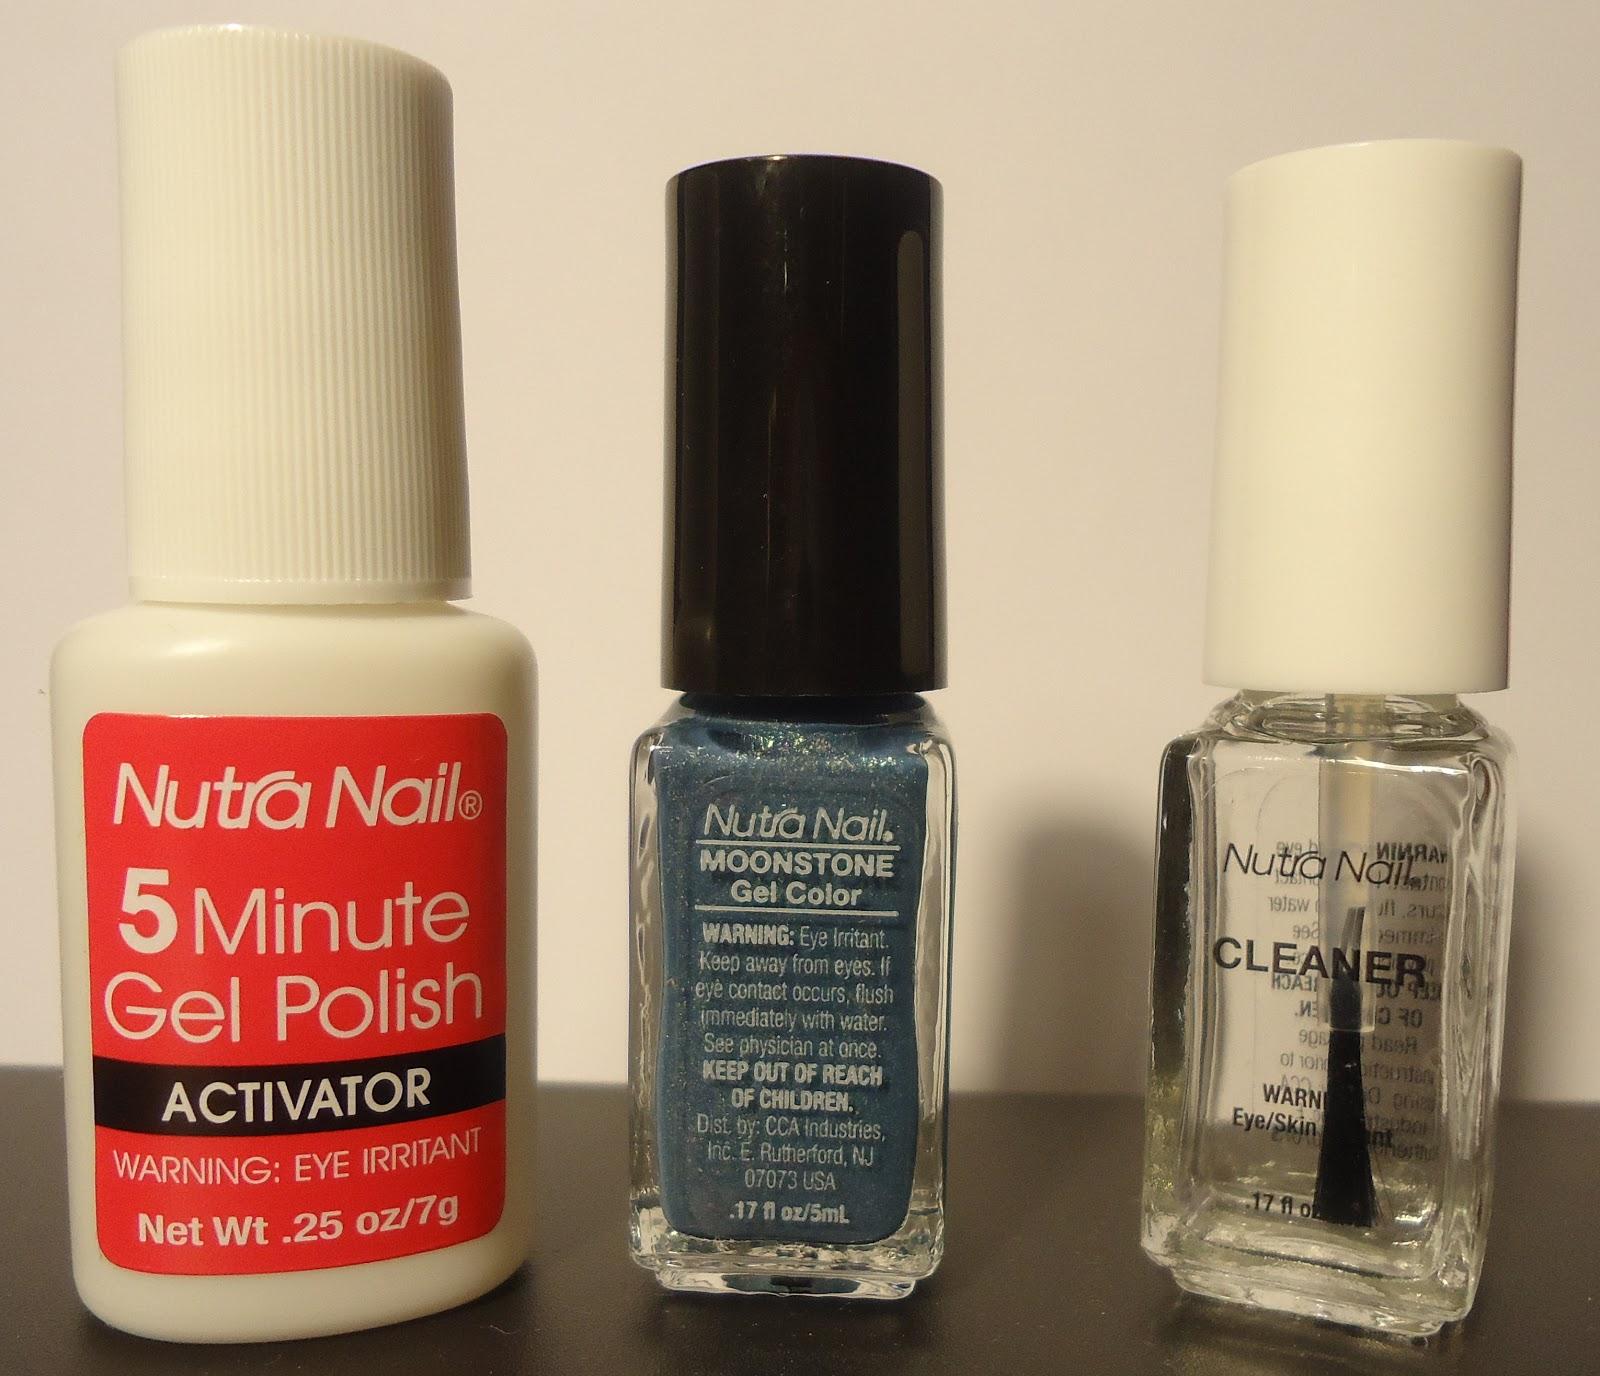 Nutra nail 5 minute gel polish